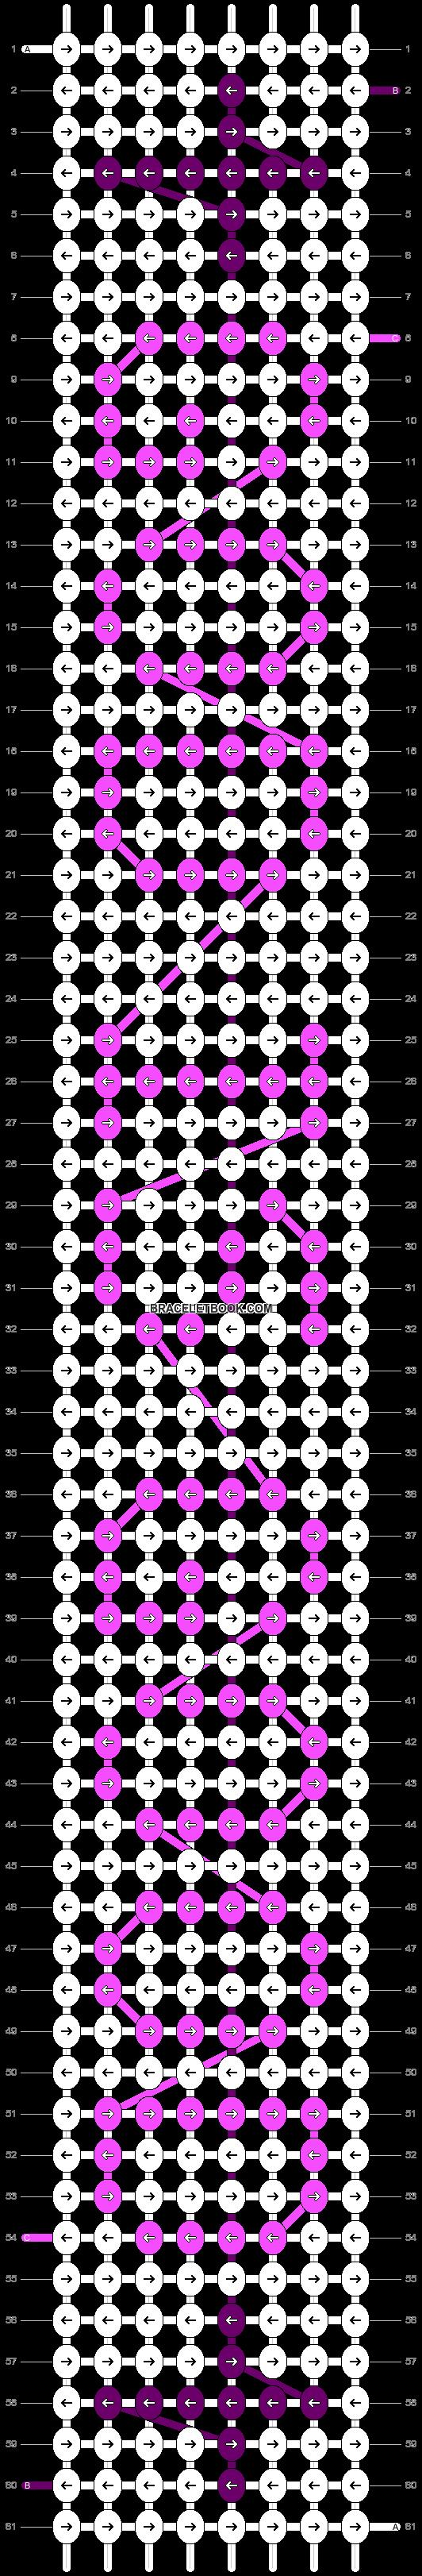 Alpha pattern #20879 pattern